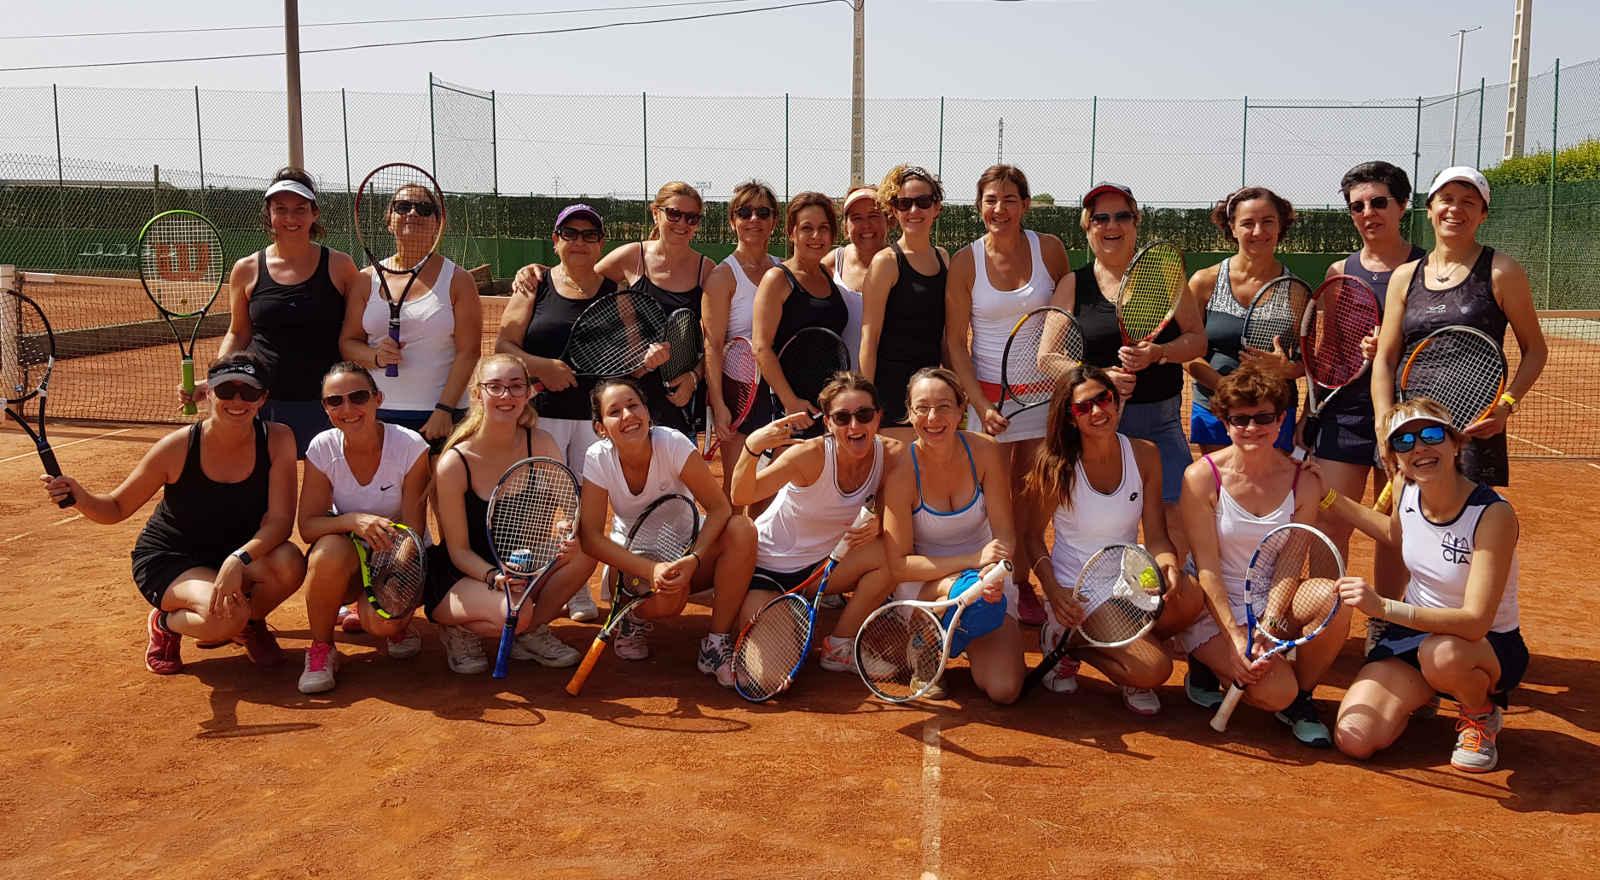 Torneo Femenino en el Club Tenis Albacete